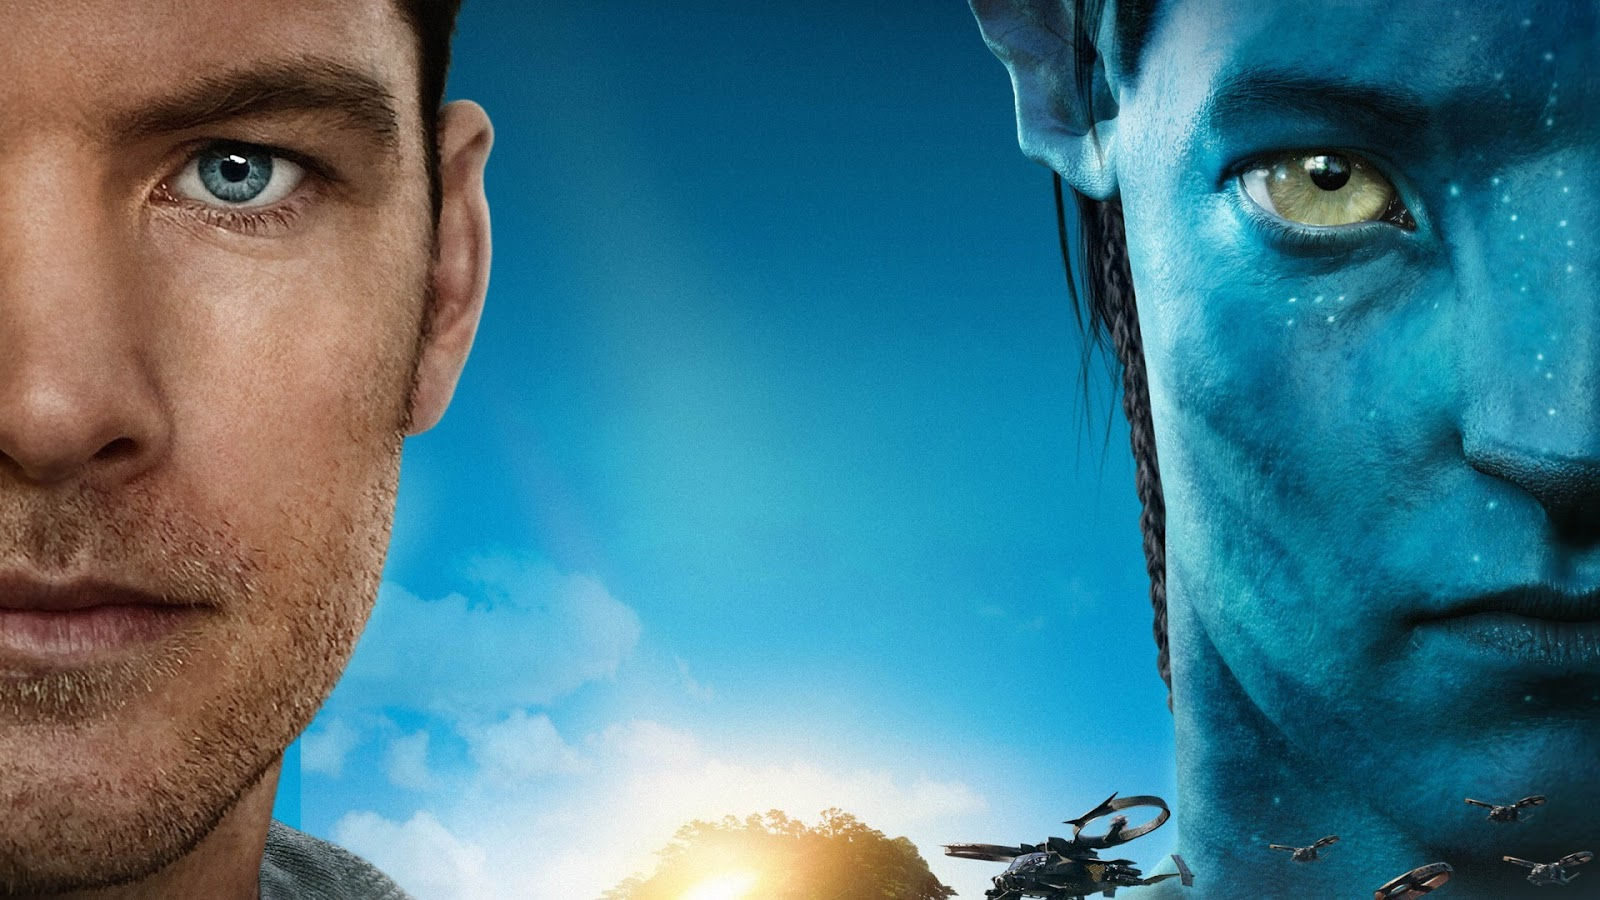 Avatar hd desktop wallpapers desktop wallpaper - Jake sully avatar ...